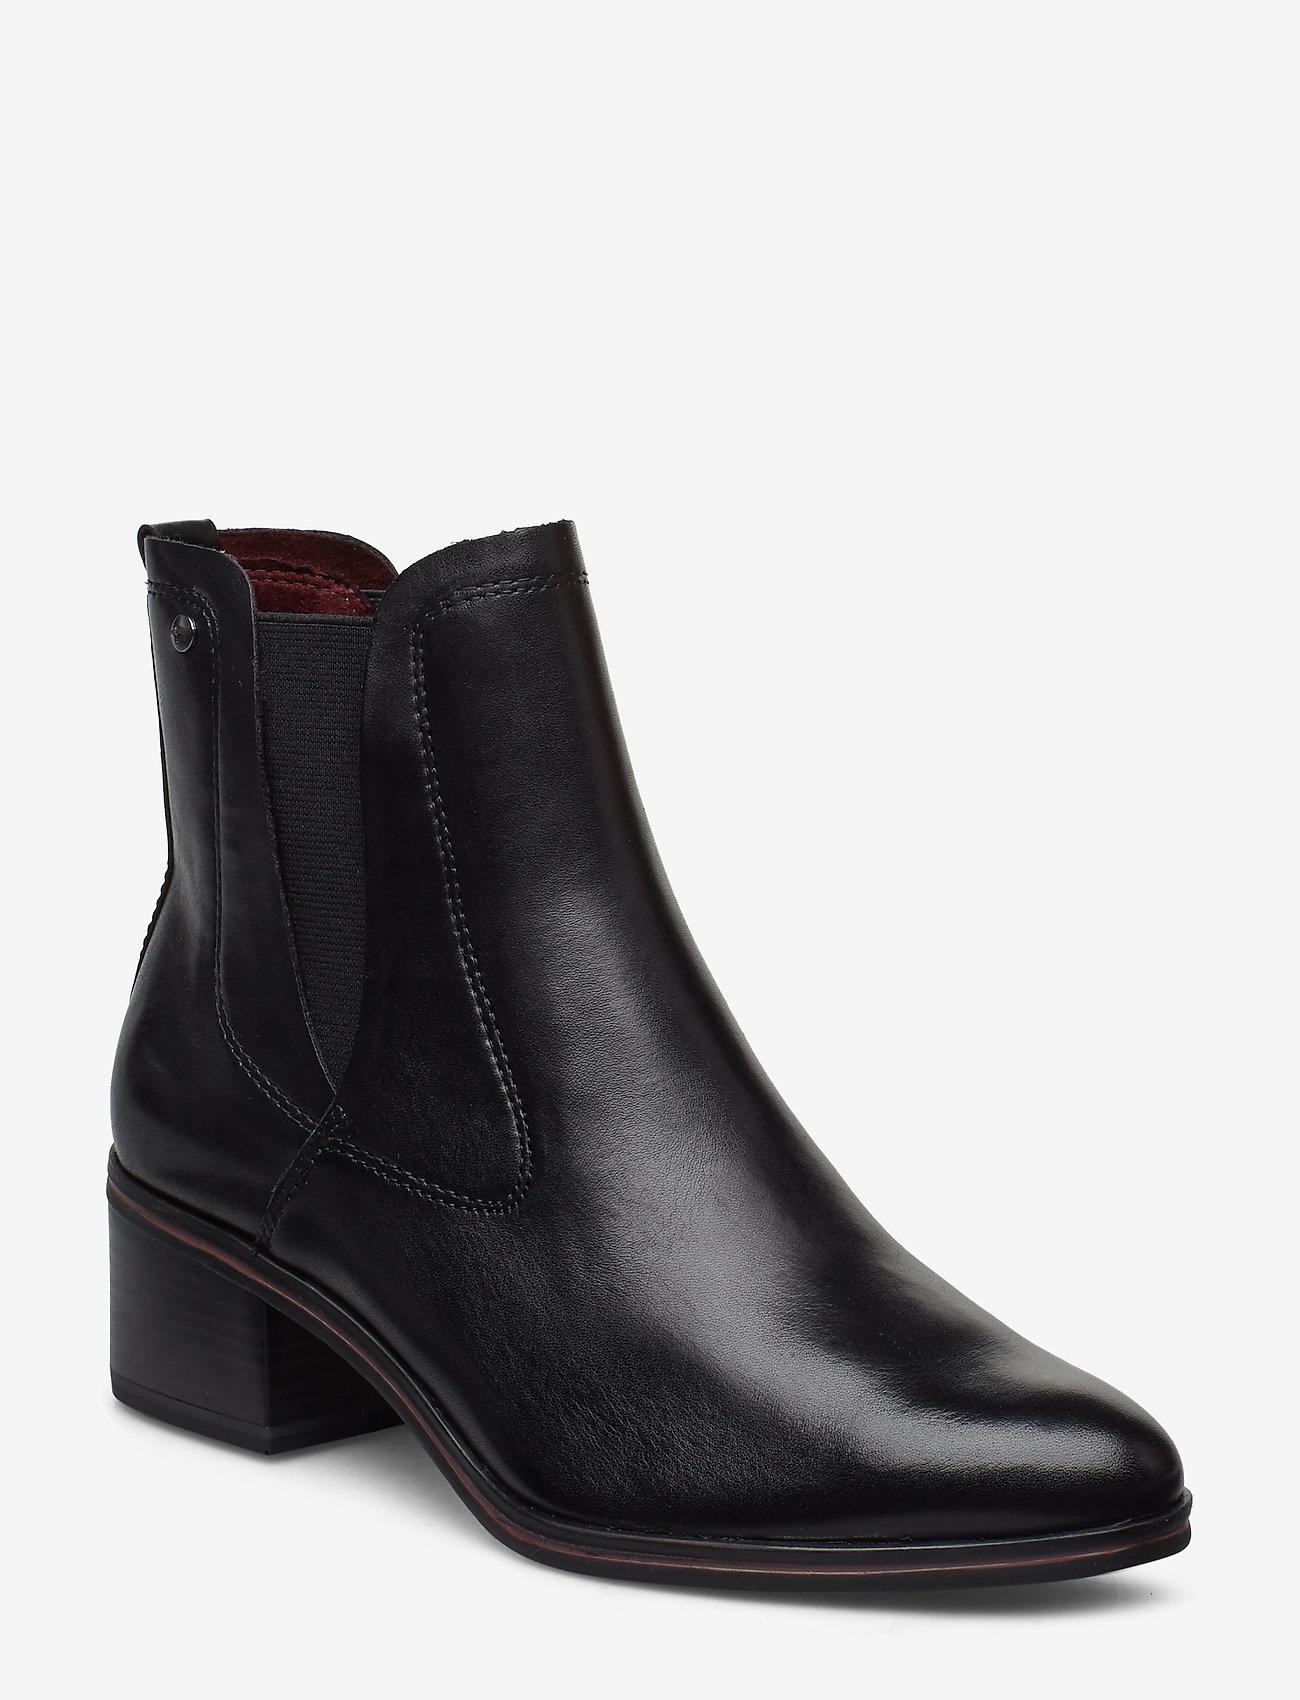 Tamaris - Boots - talon haut - black - 0